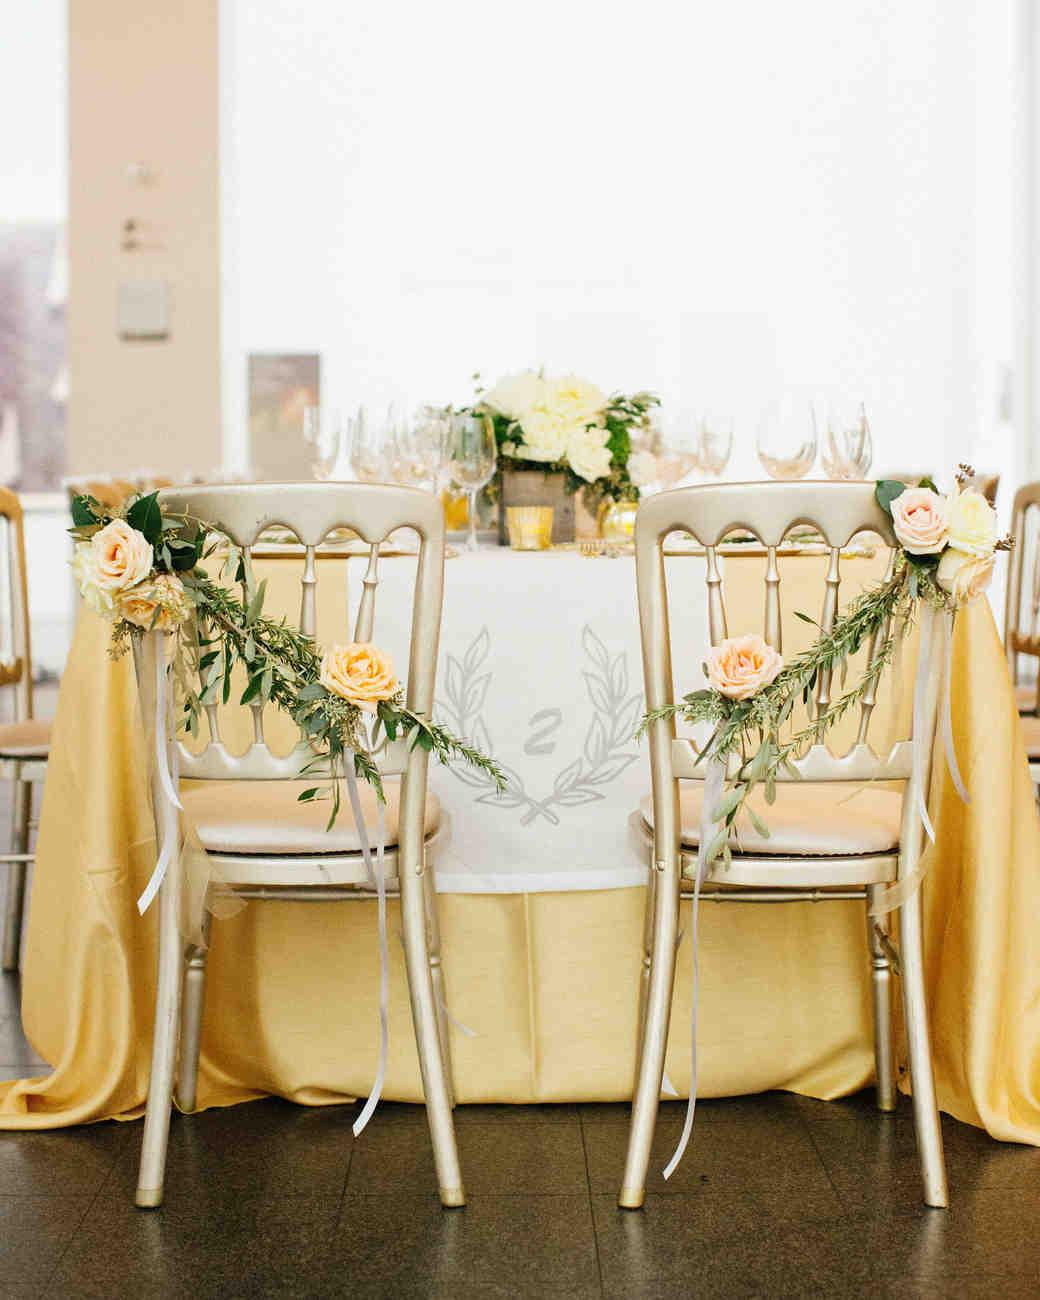 aiasha-charles-wedding-chairs-0514.jpg